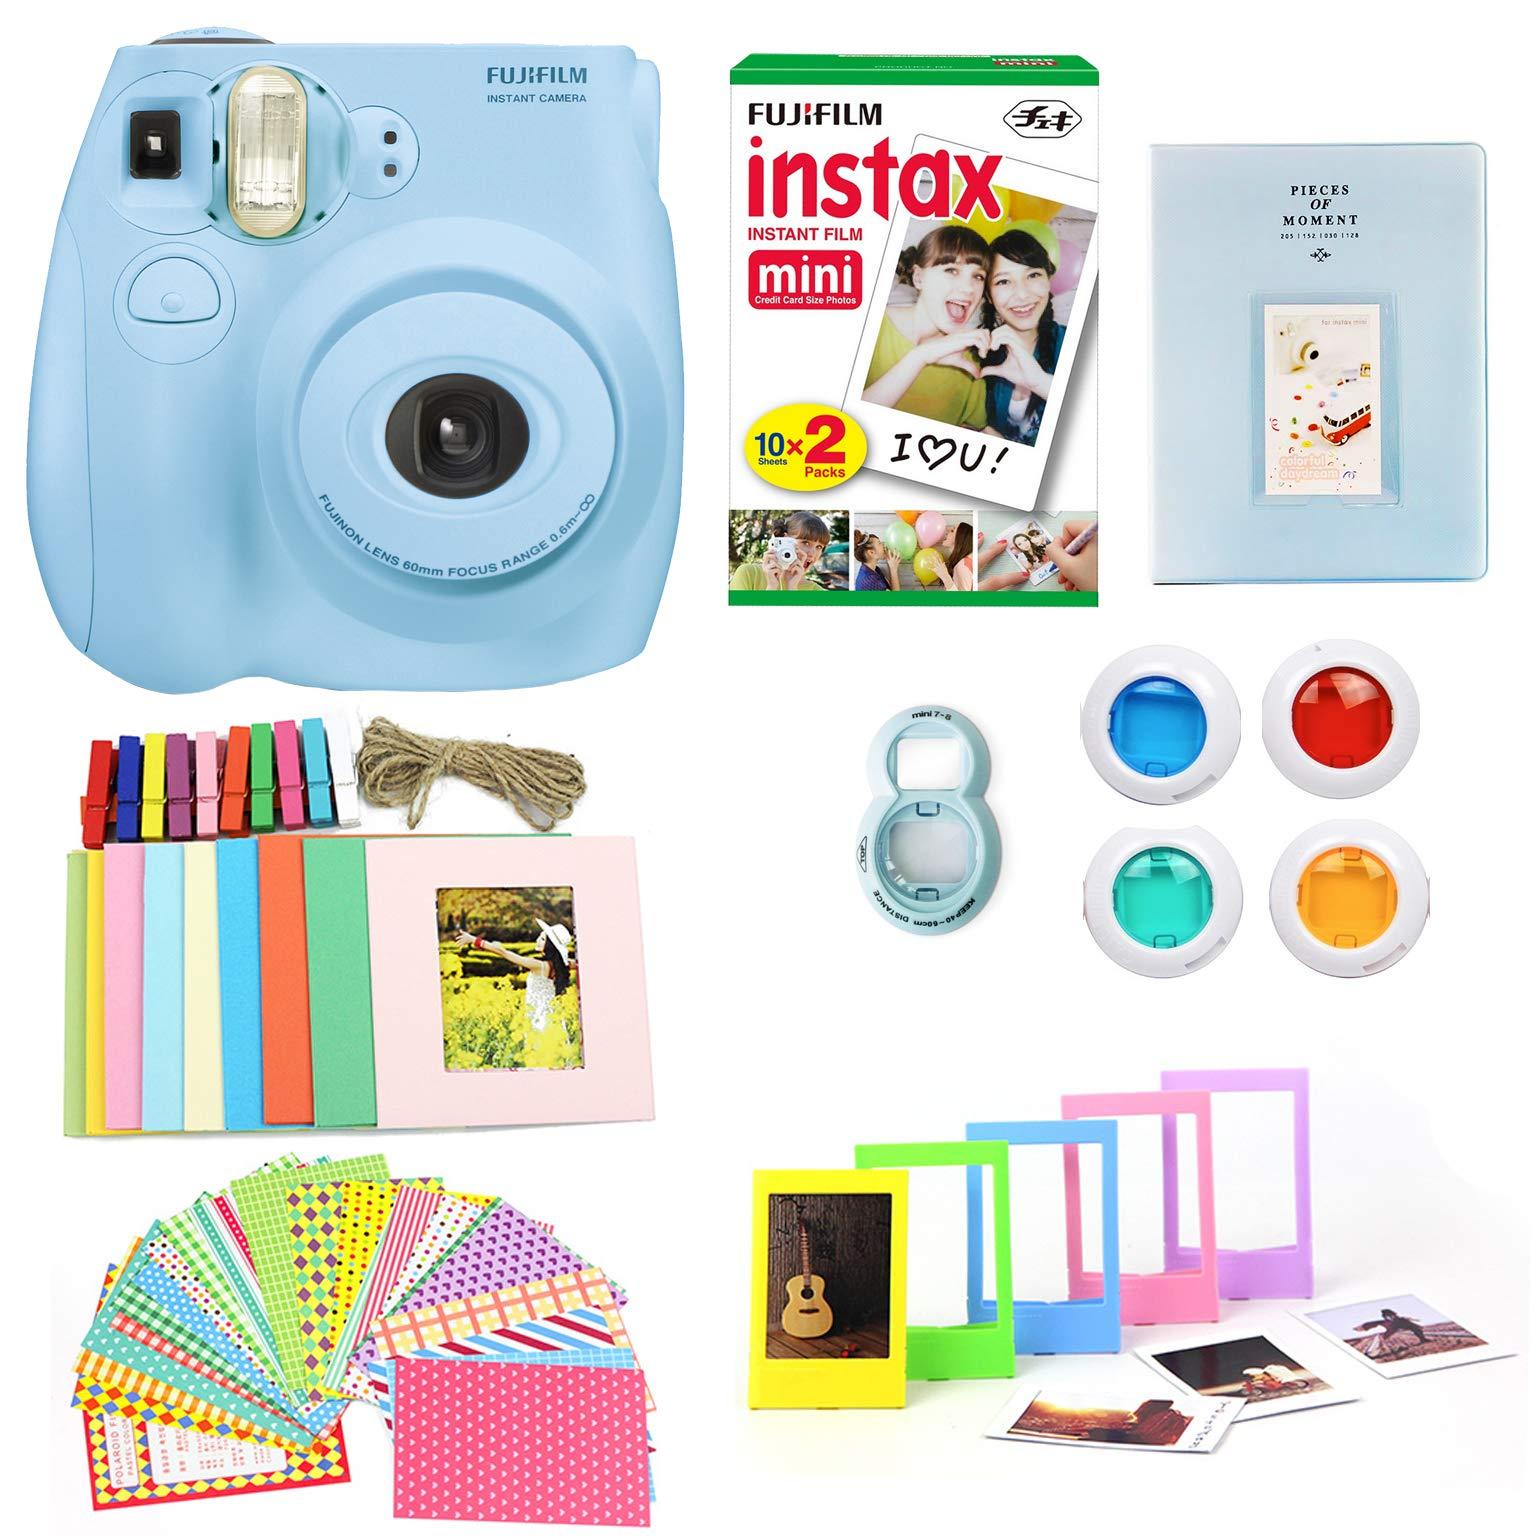 Fujifilm Instax Mini 7S Camera + Photo Accessories Bundle - New Renewed Instant Camera w Fun + Colorful Album, Stickers, Frames, Close Up Lens & Color Filters (Light Blue) by Fujifilm